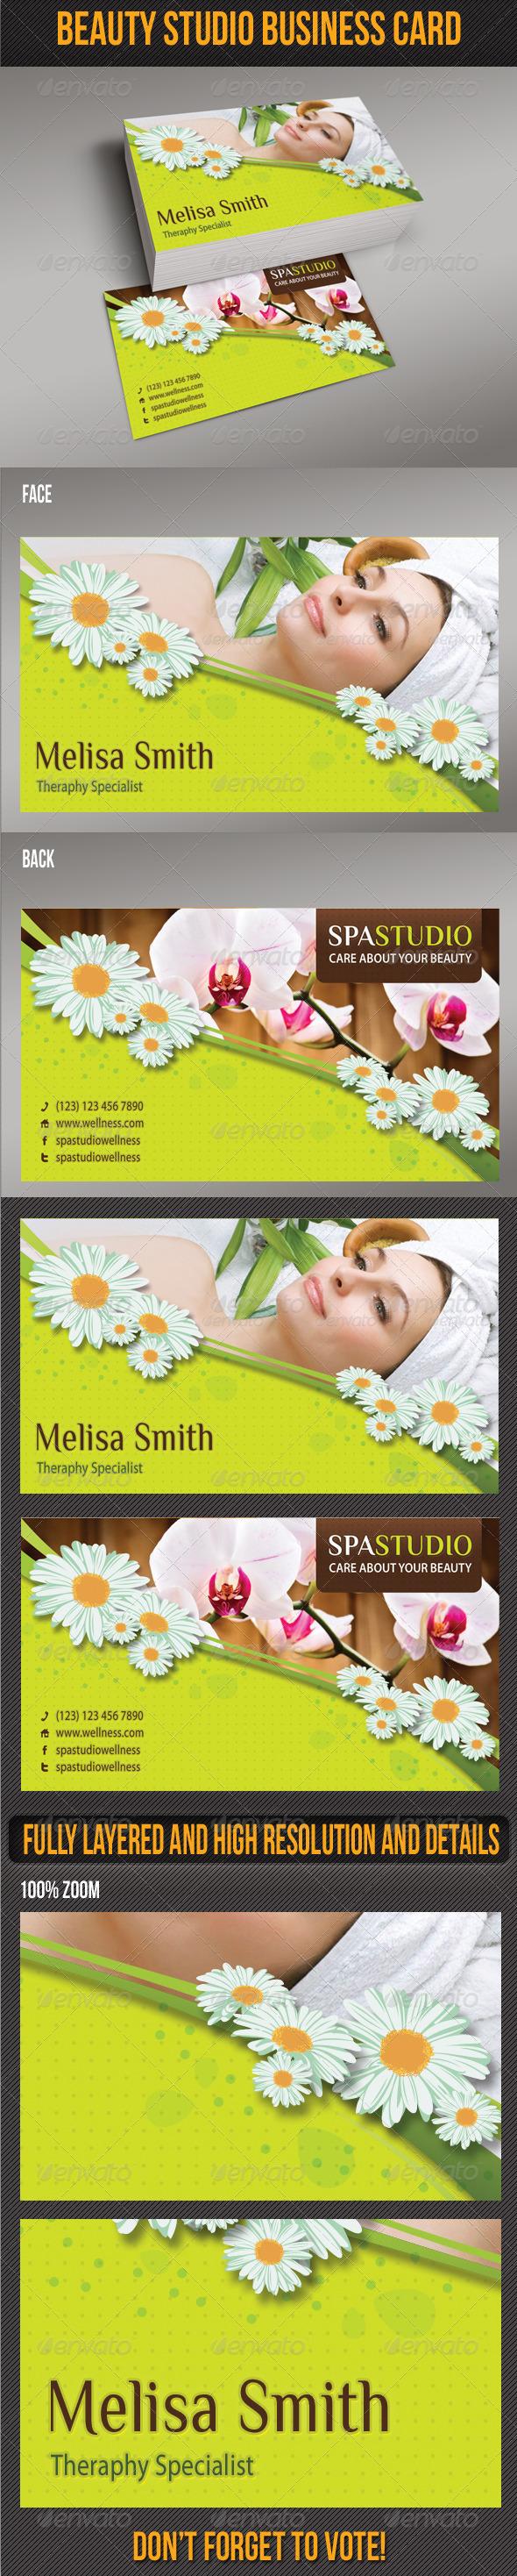 Spa Studio Business Card 03